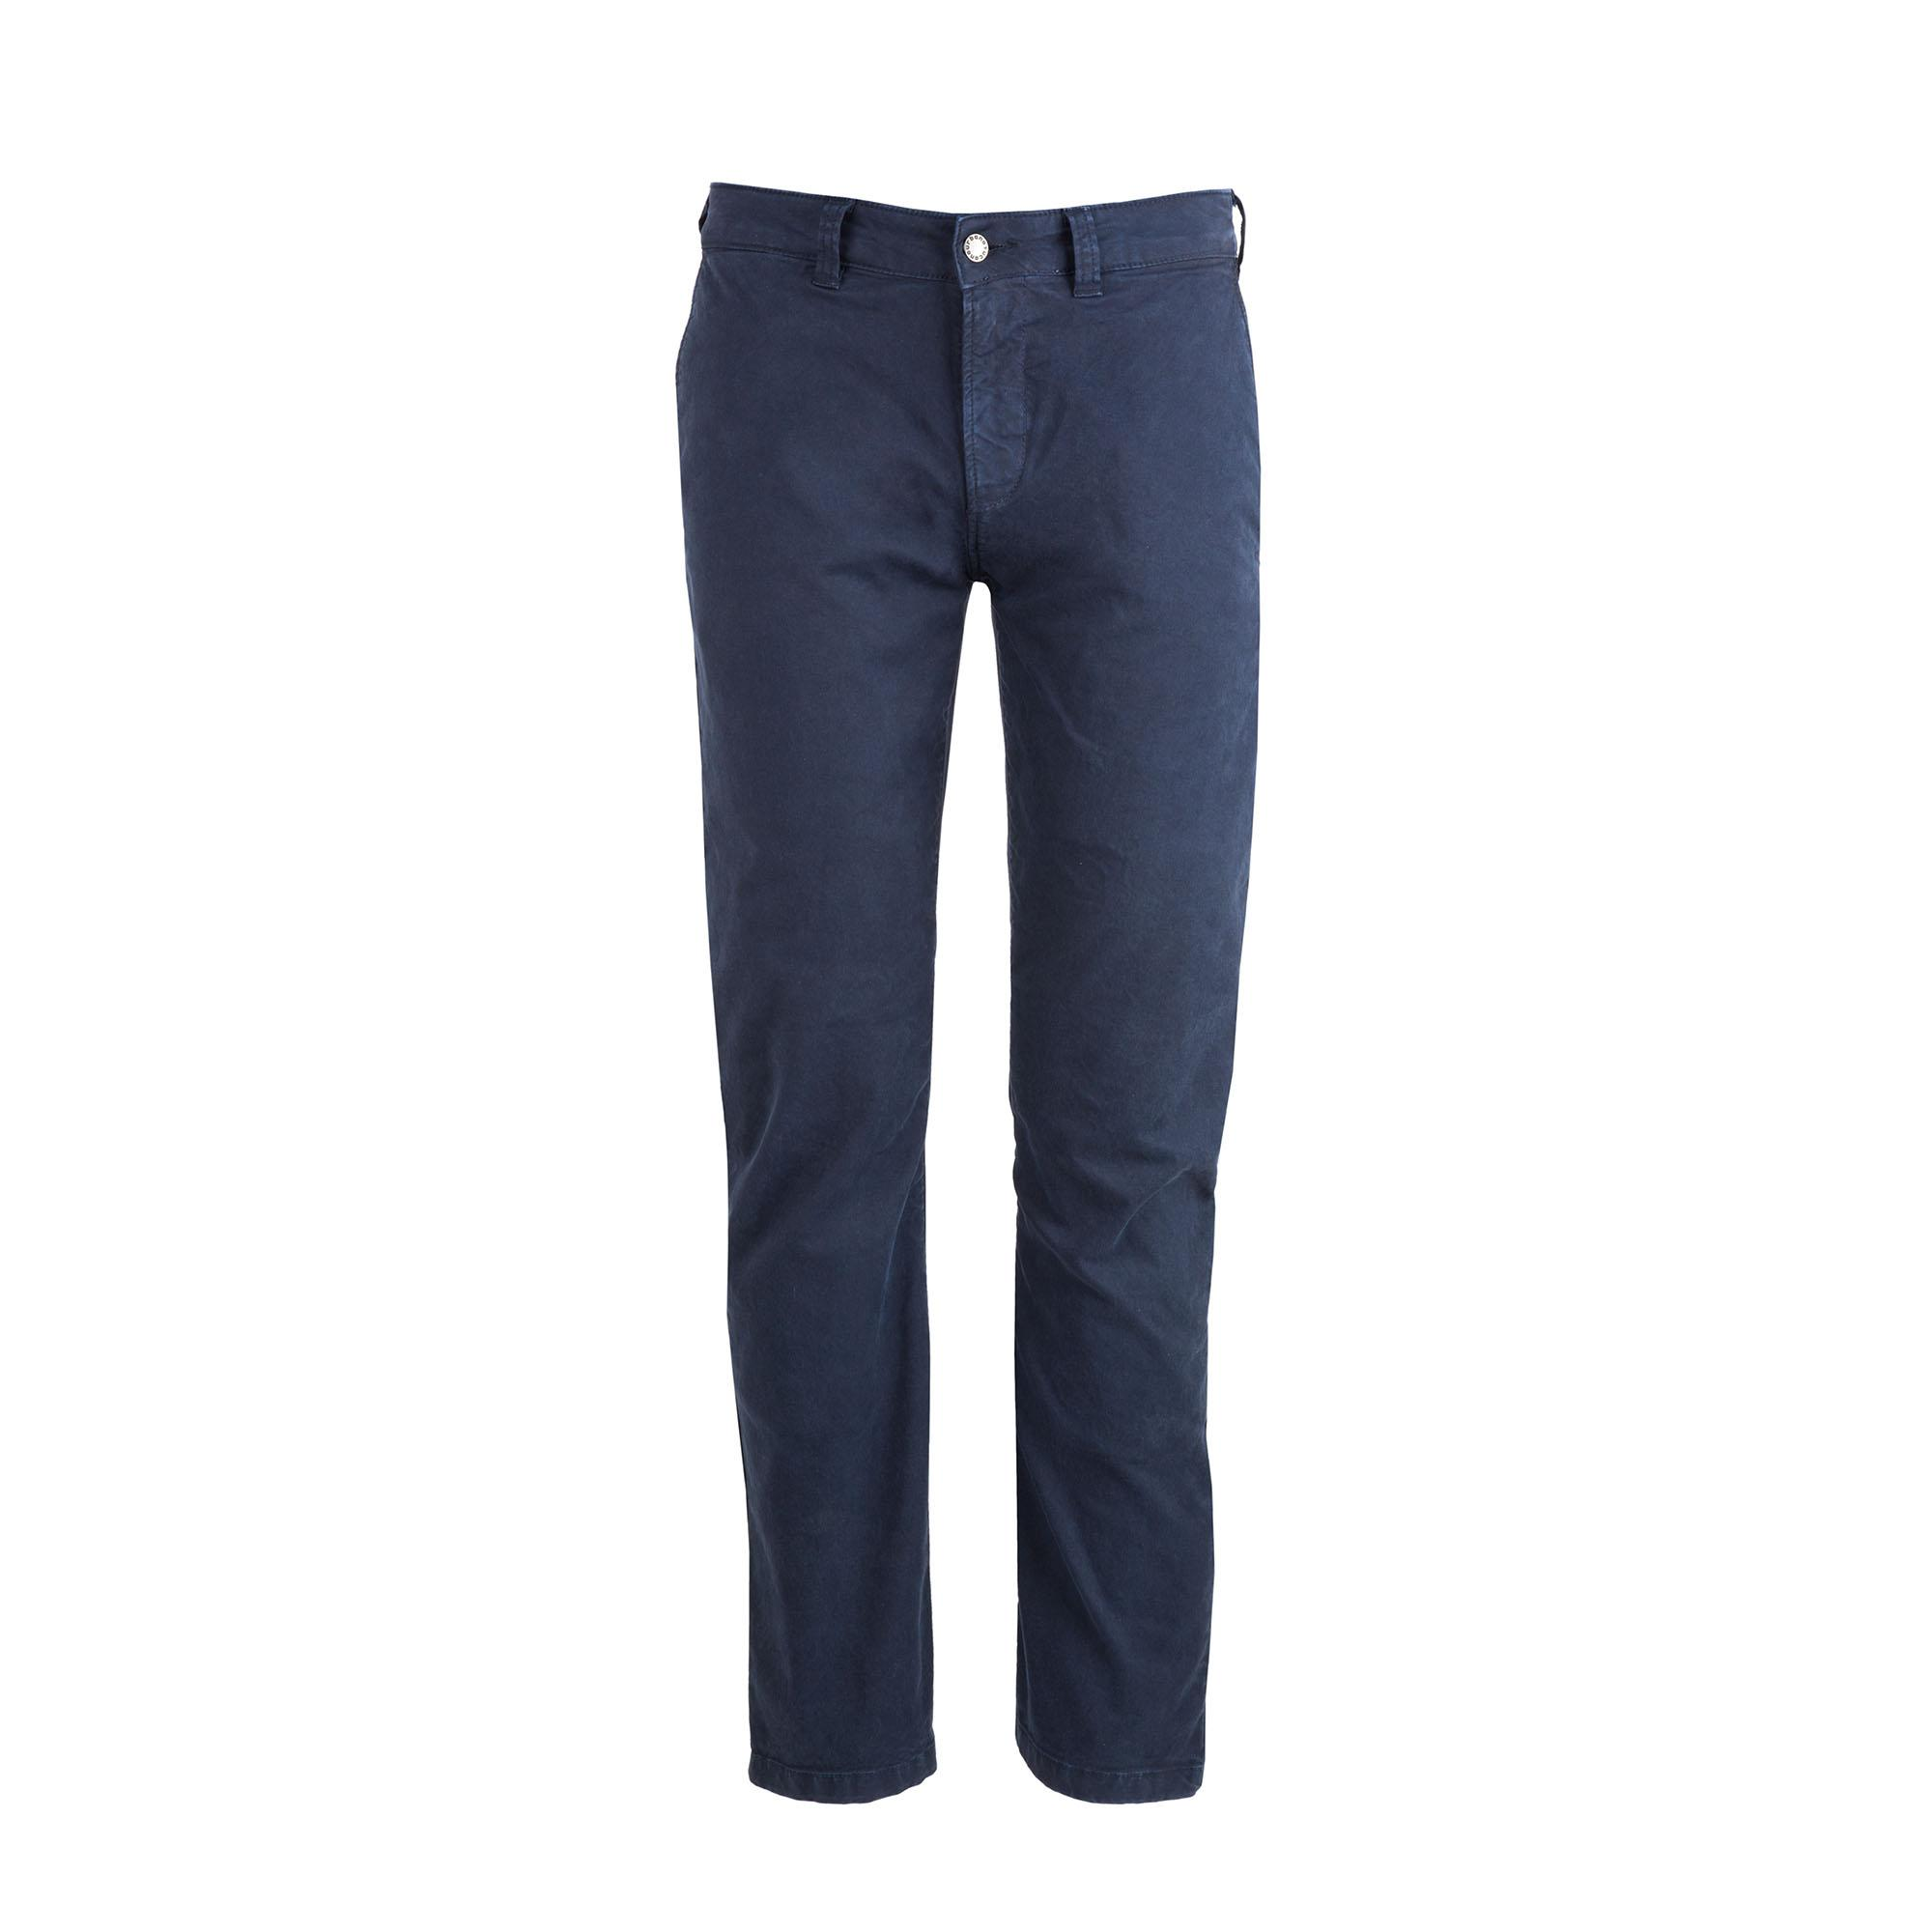 Pantaloni Leonchino Gag Blu